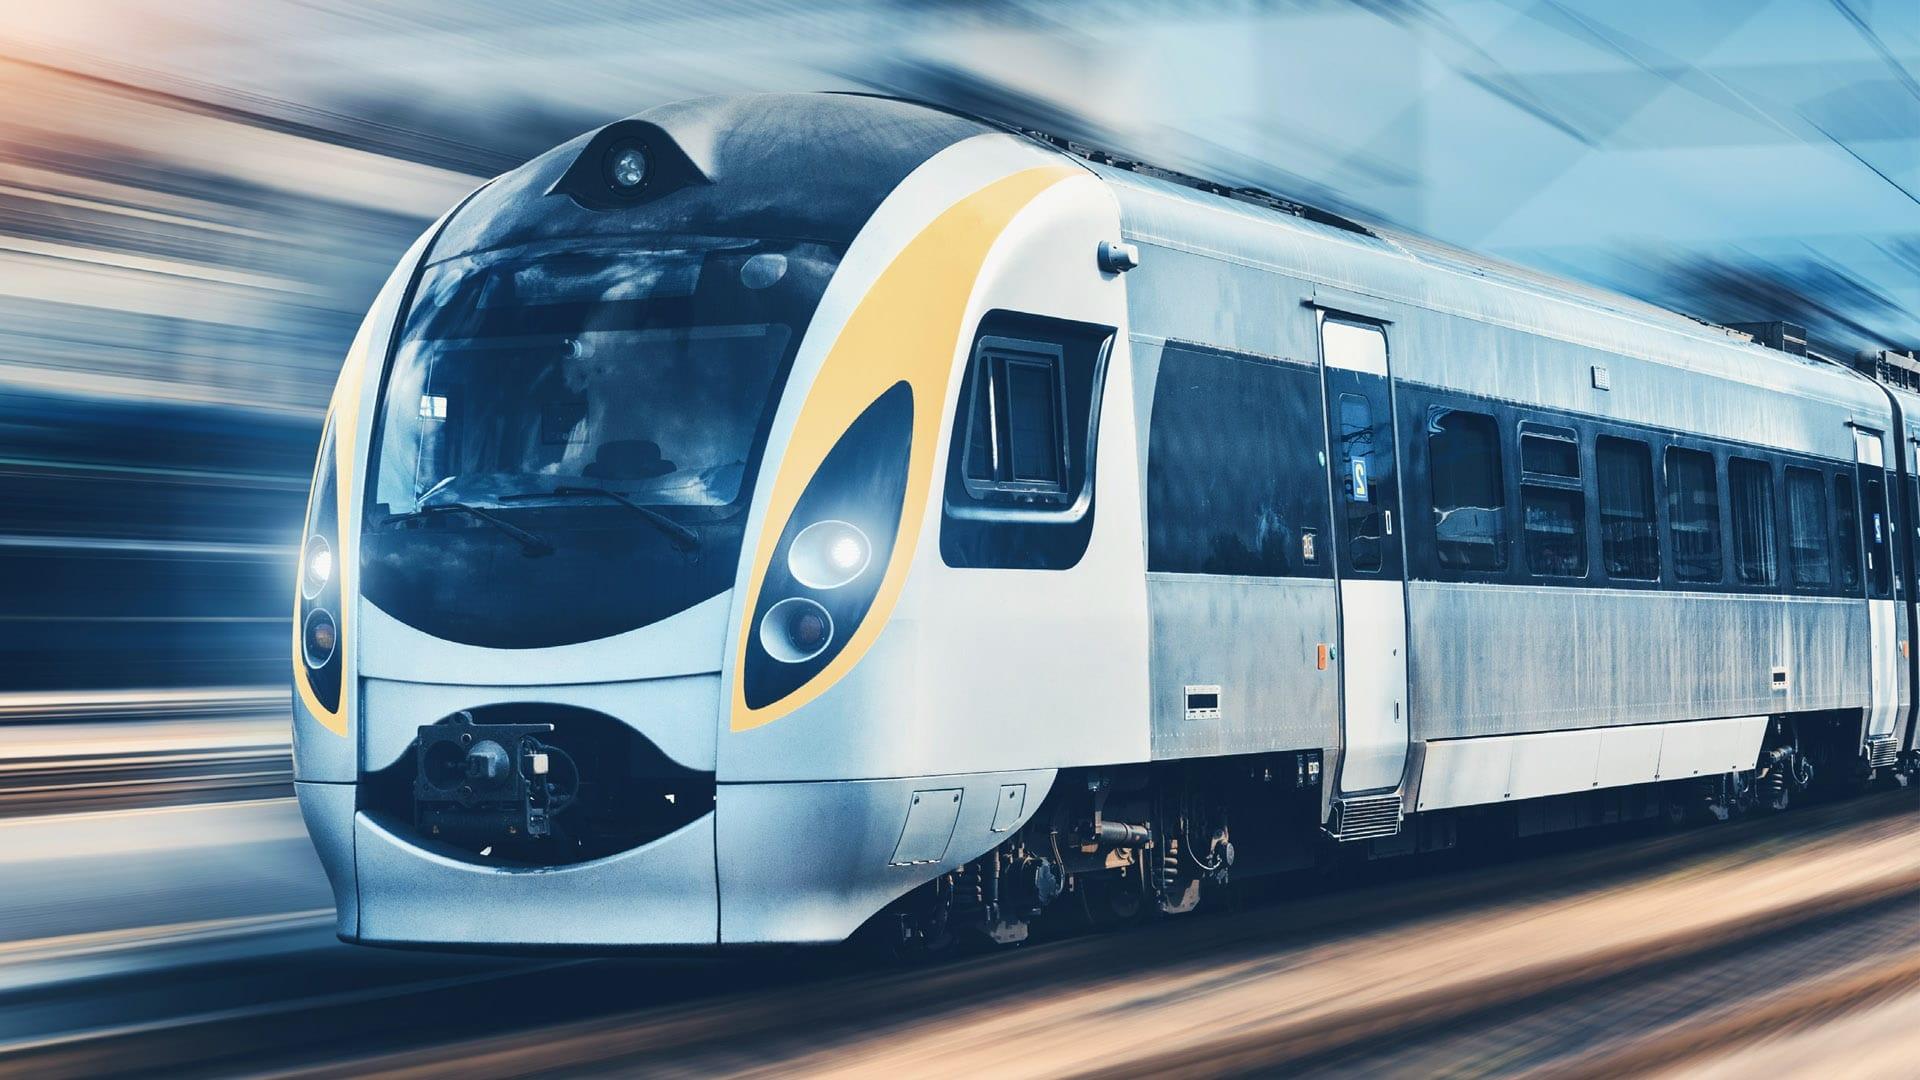 epoxy coating for rail